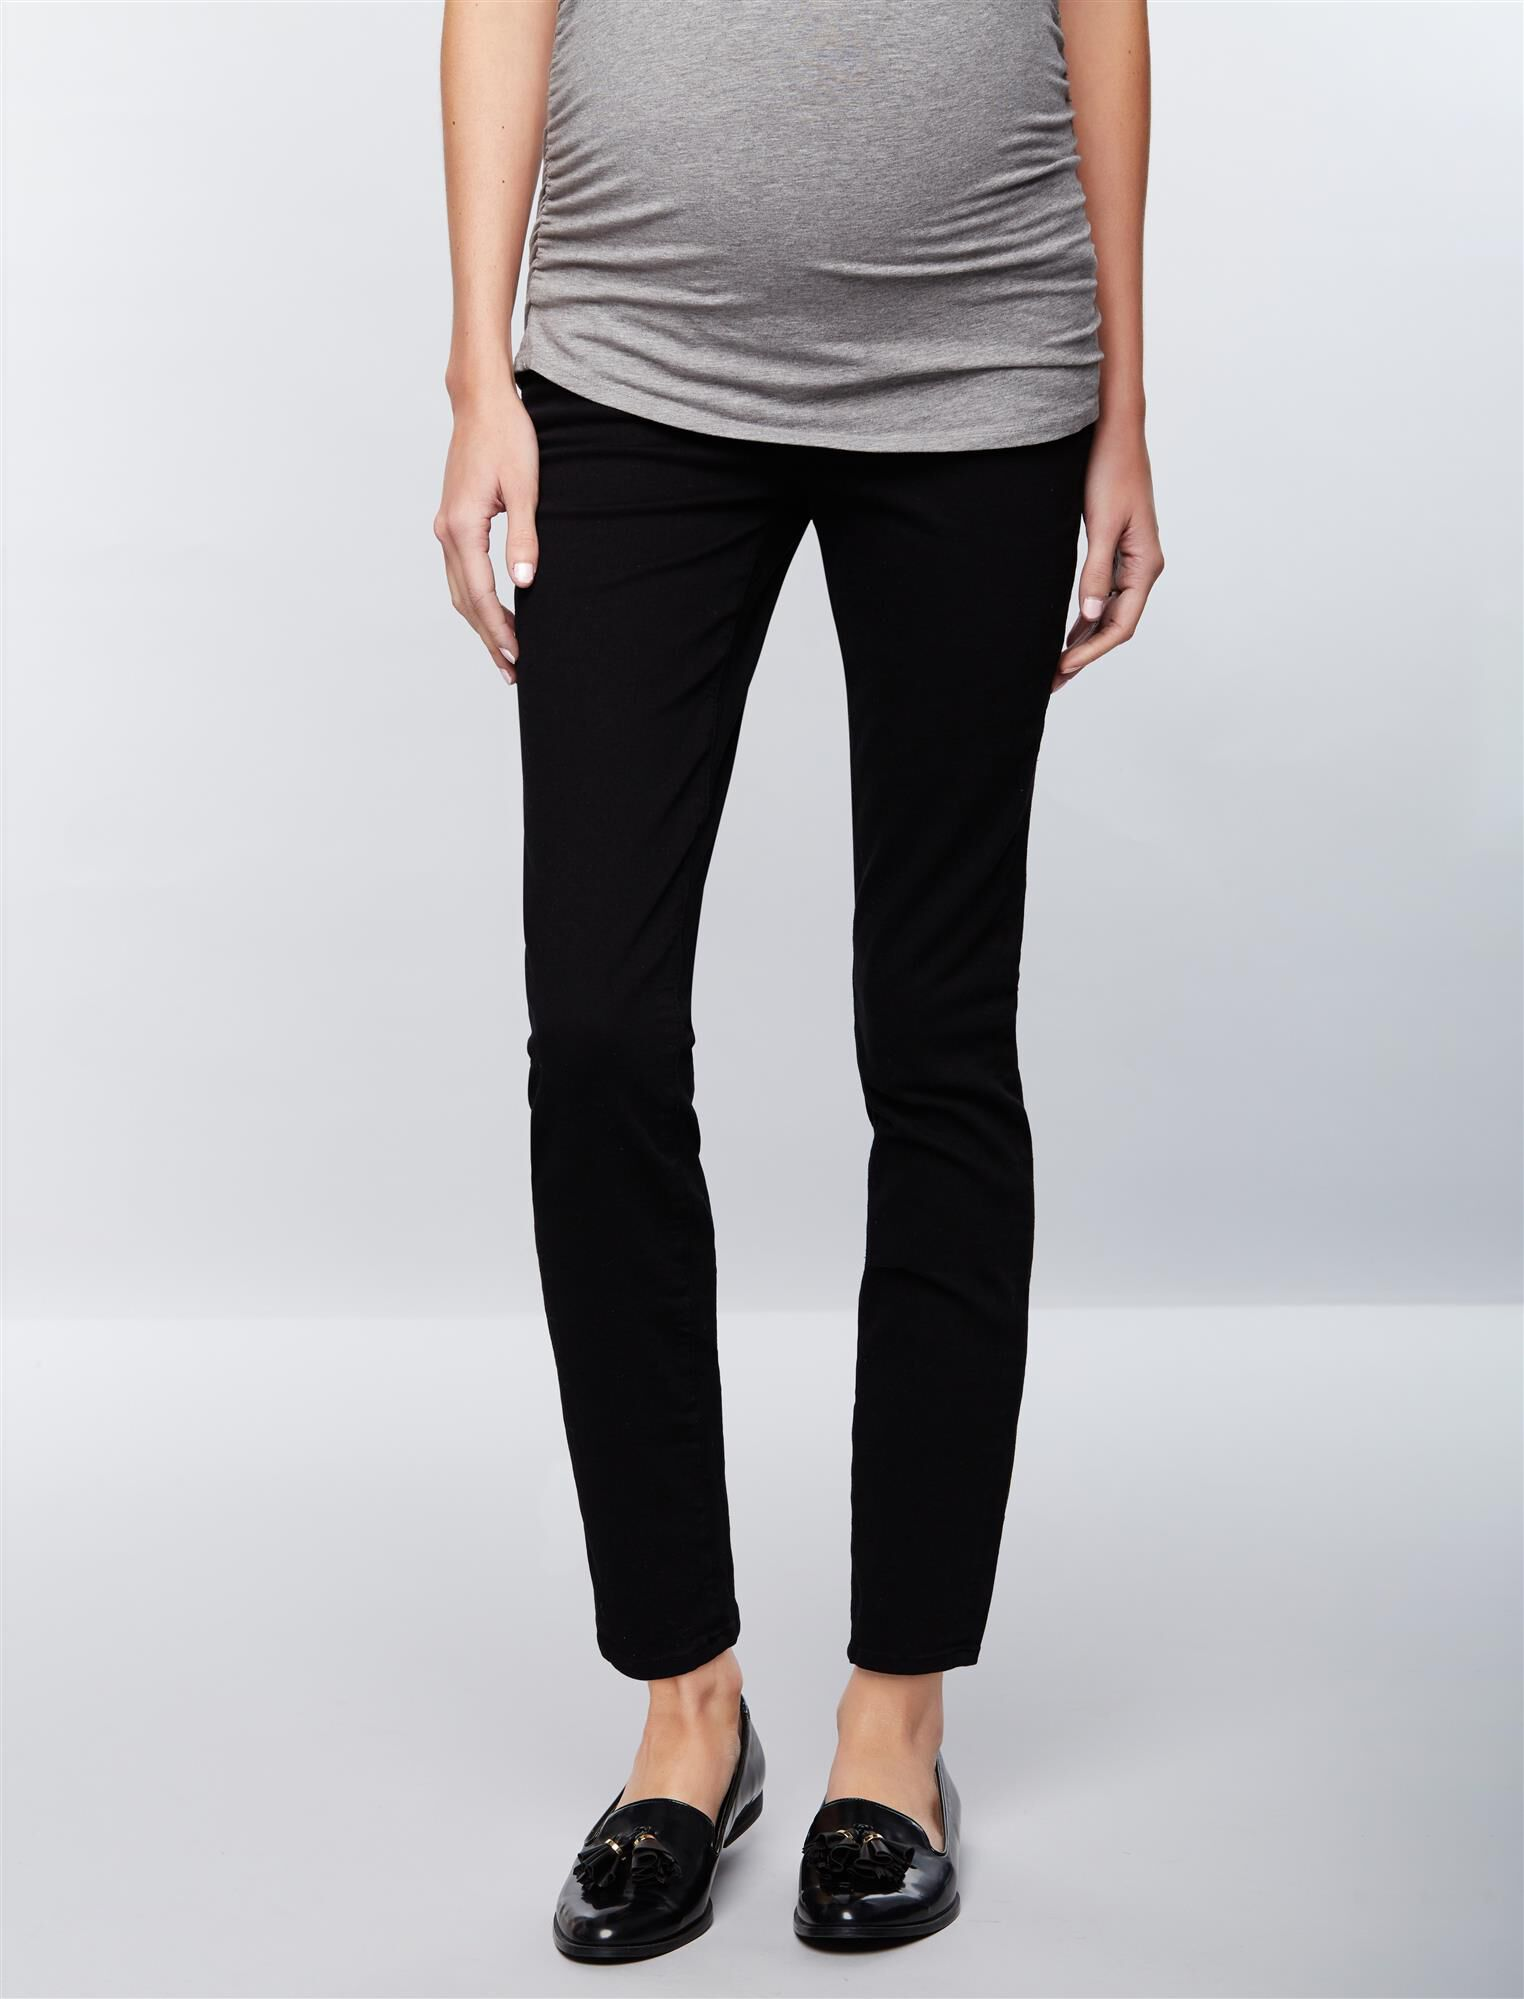 FRAME Secret Fit Belly Le Skinny de Jeanne Maternity Jeans- Film Noir